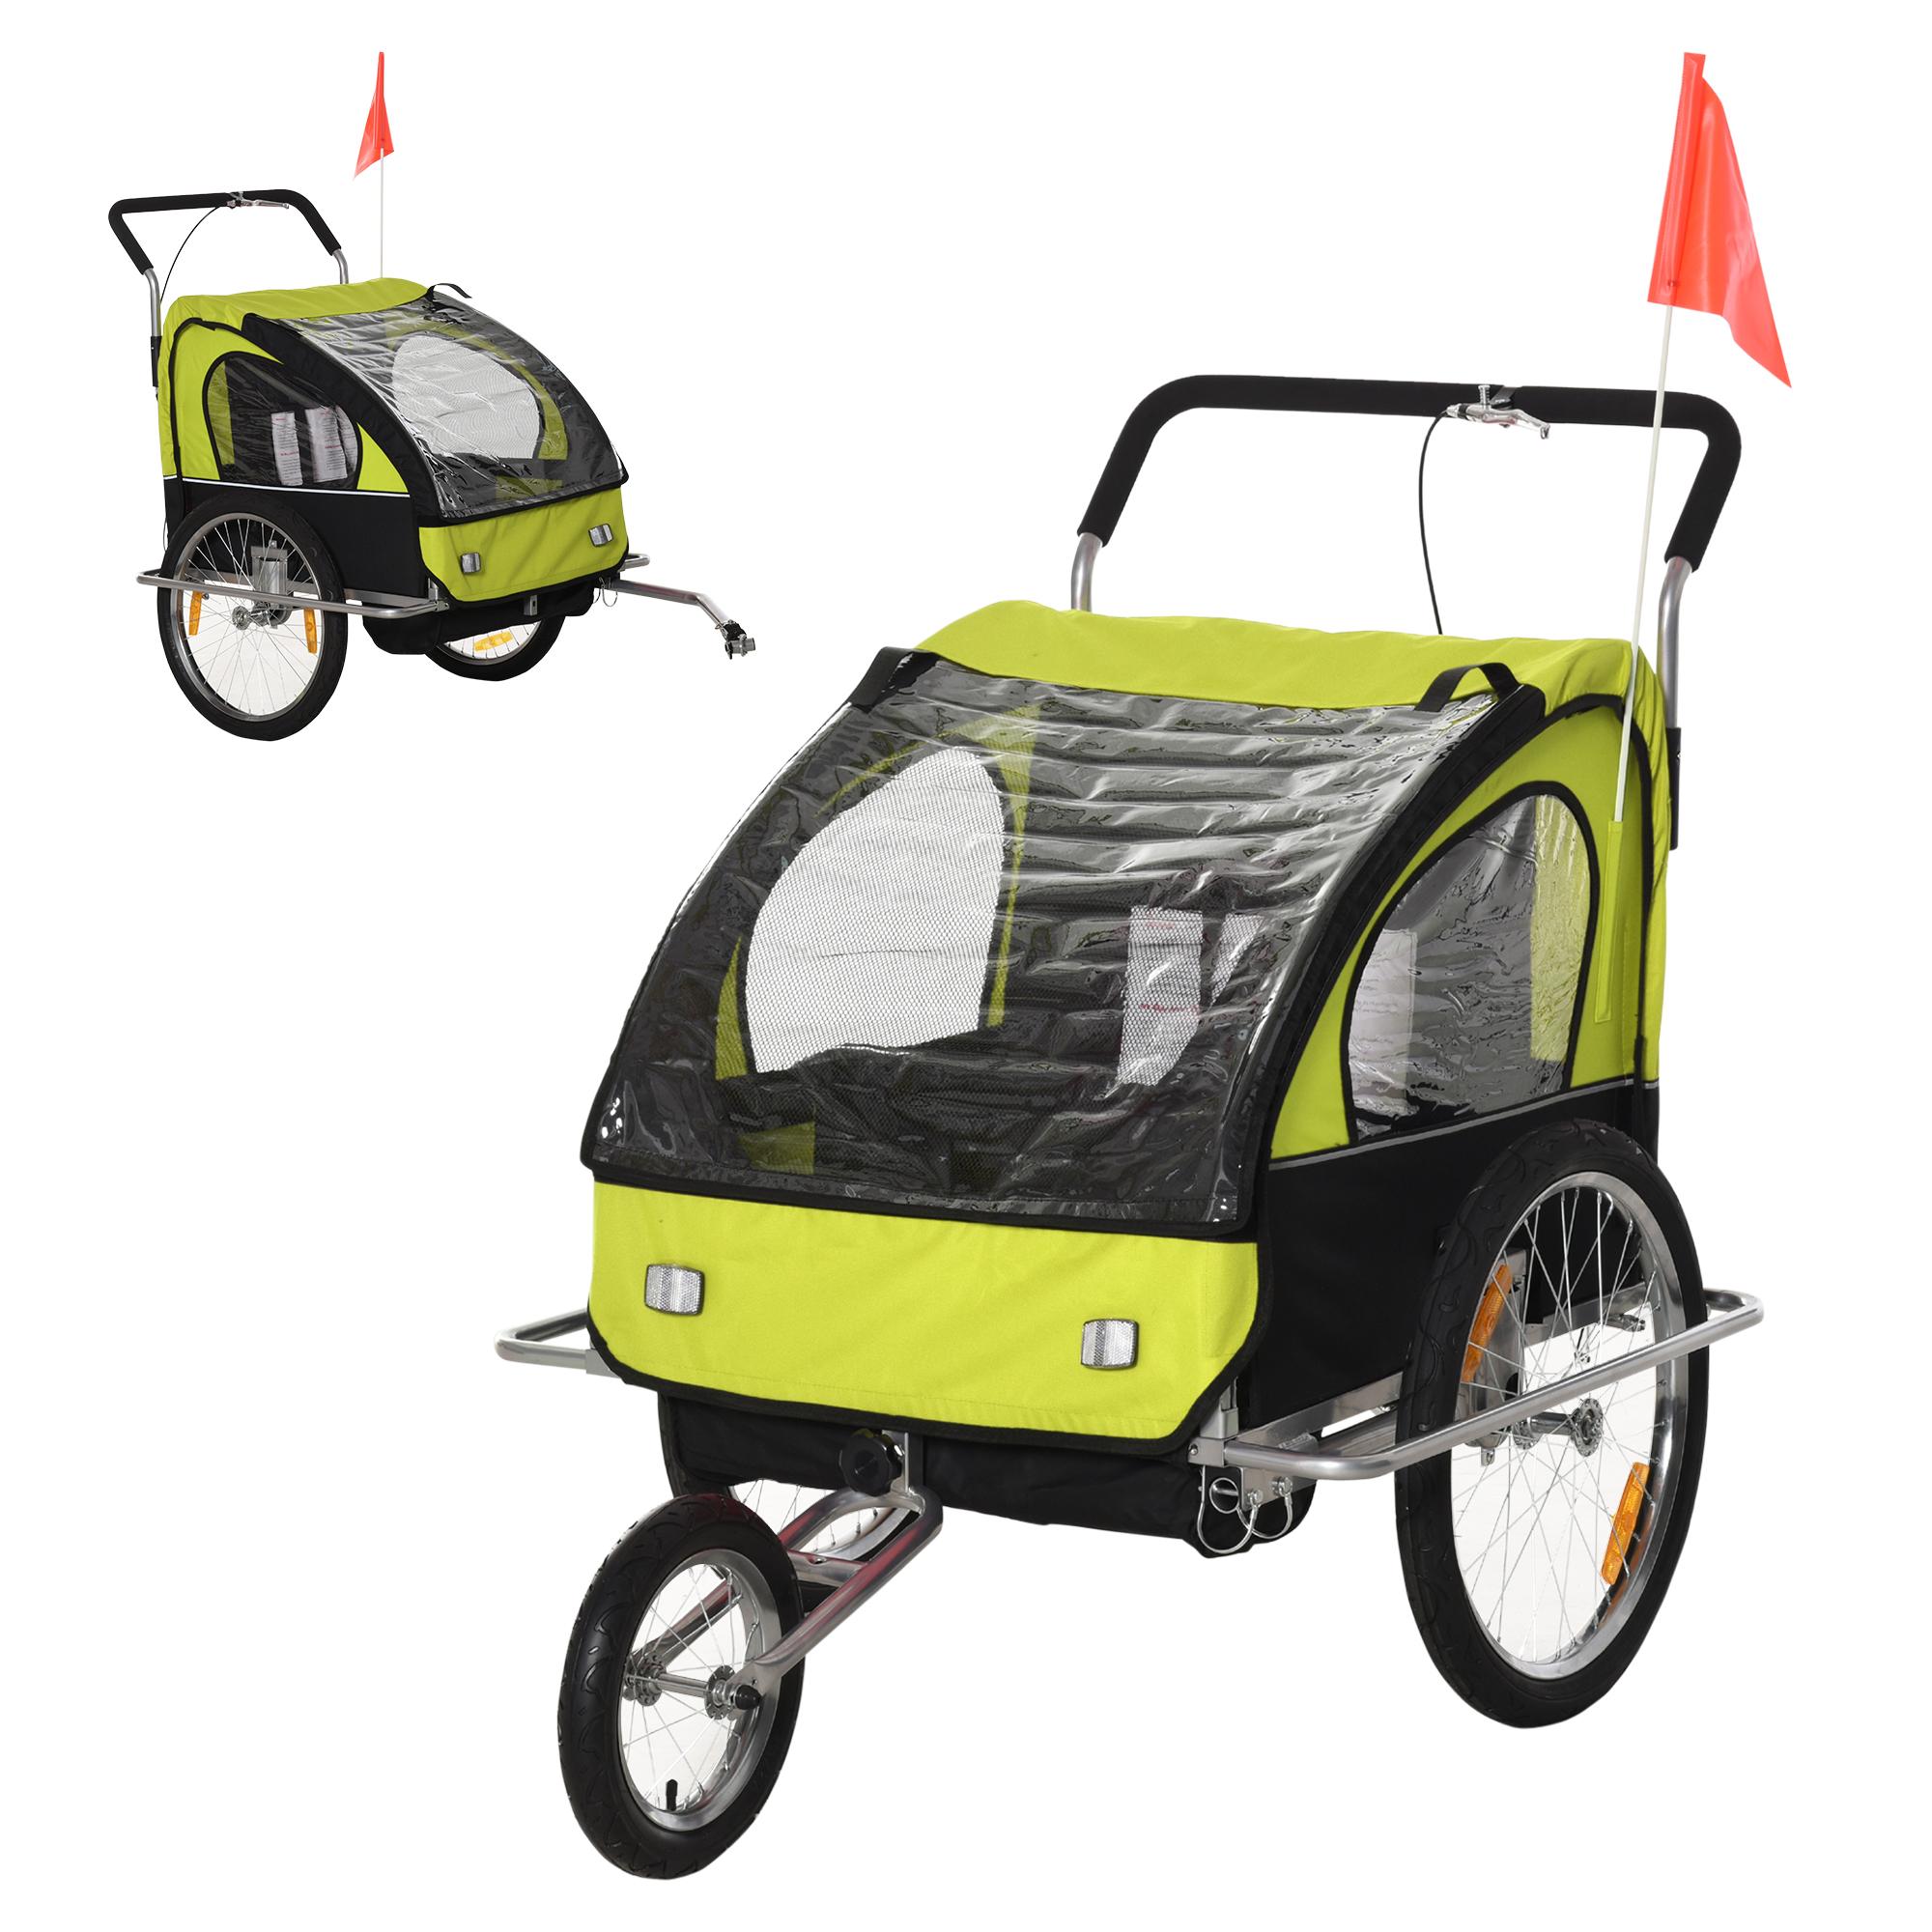 miniatura 41 - Remolque Bicicleta Niño 2 PLAZAS+Amortiguador Kit Footing Freno Bandera Cubierta